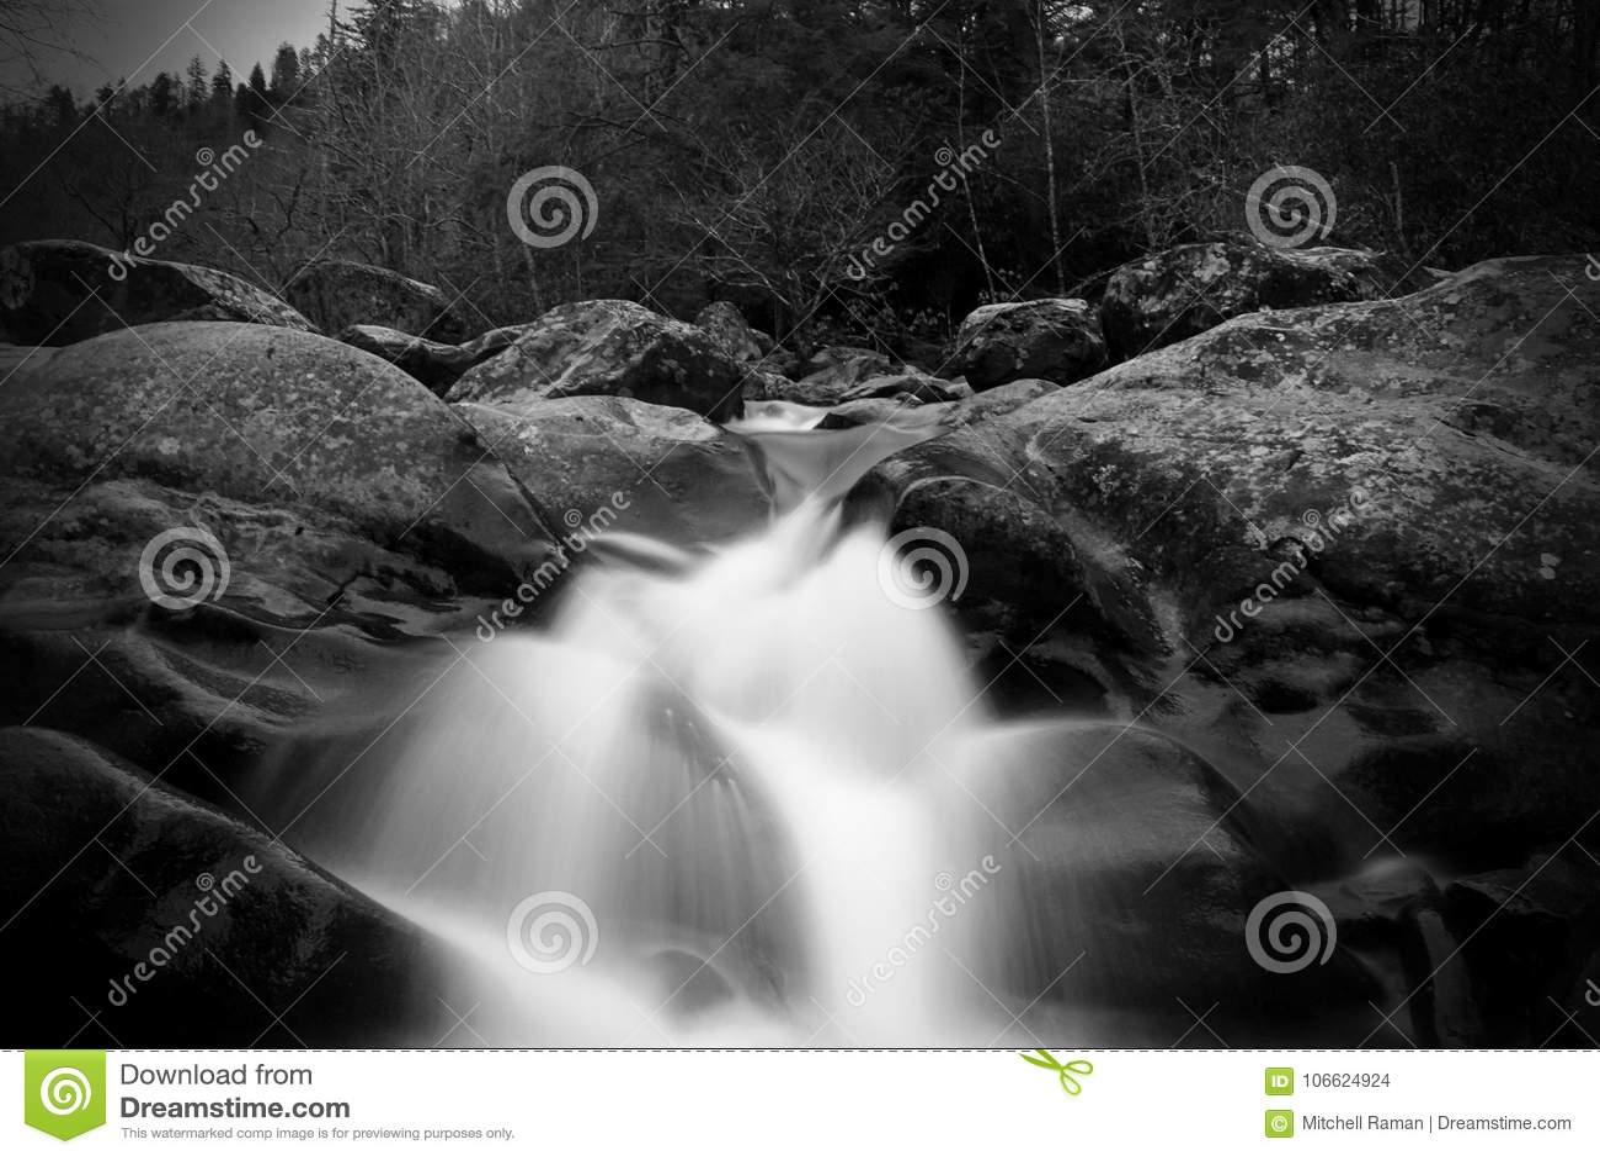 Greyscale θολωμένη κίνηση και αργή φωτογραφία Waterscape παραθυρόφυλλων μιας πτώσης νερού πέρα από μεγάλες πέτρες